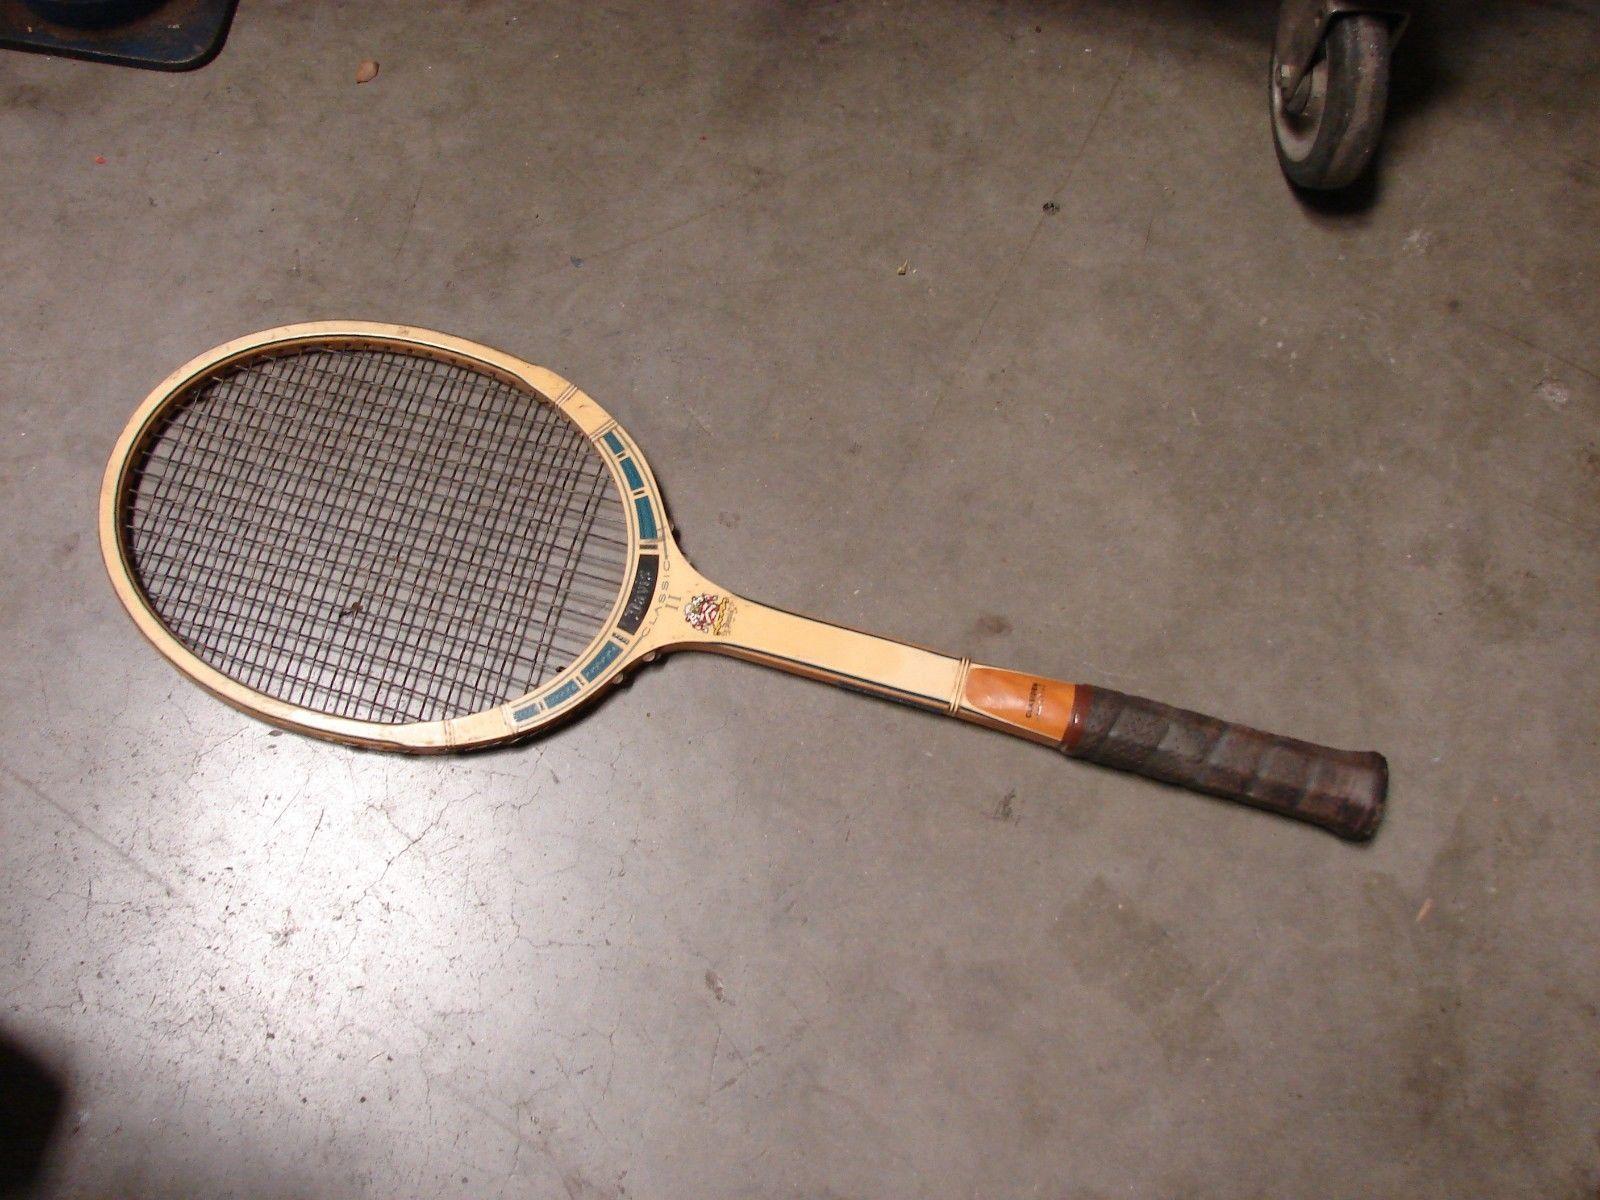 Vintage TAD Davis Wooden Tennis Racket Davis and 50 similar items 844224326e2cc